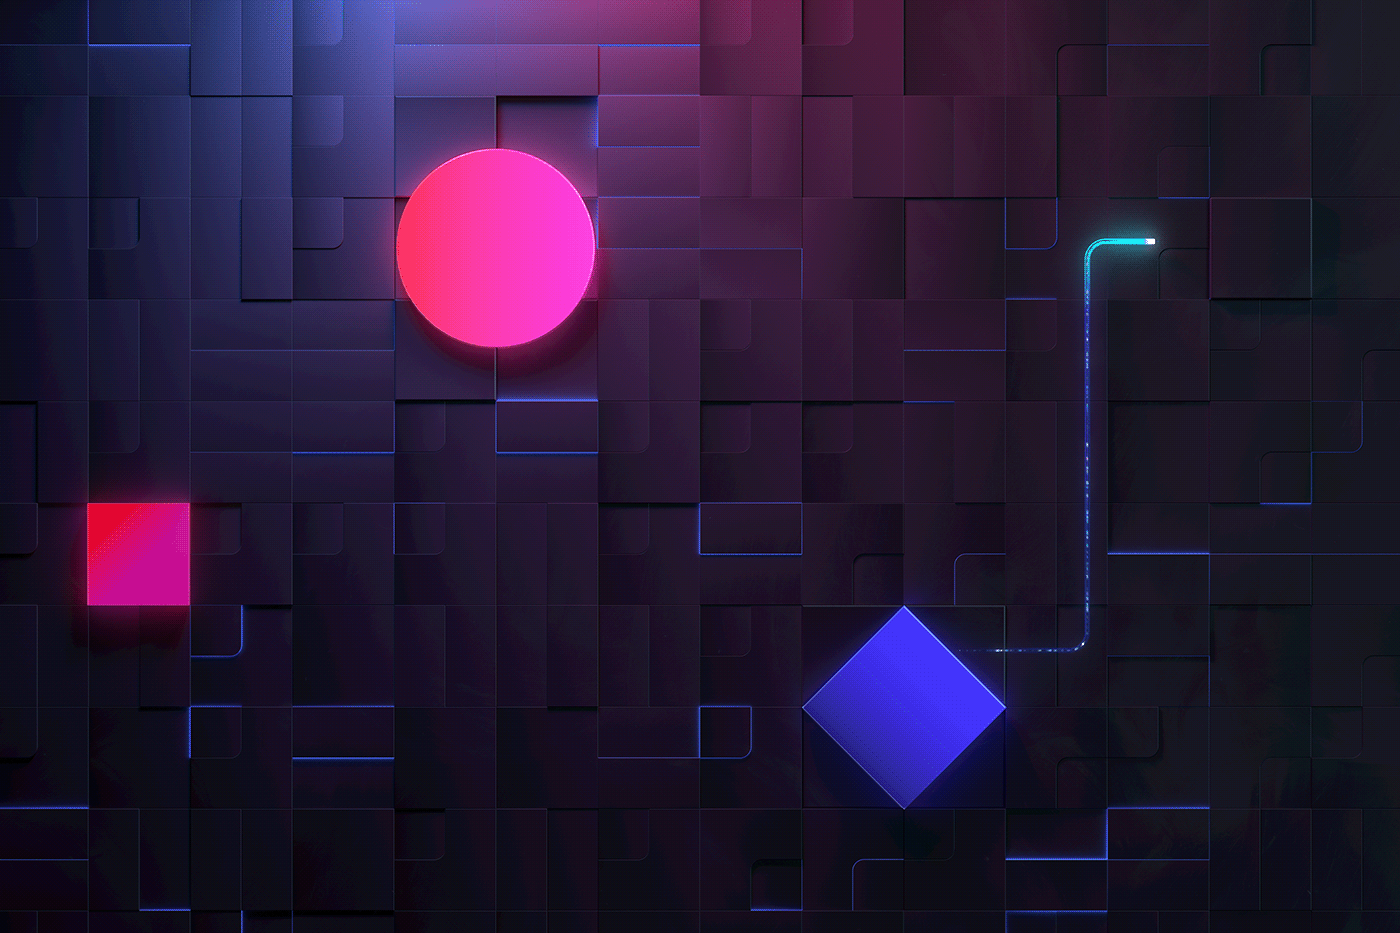 tech motiongraphics motiondesing Technology light developer Event grid neon dark